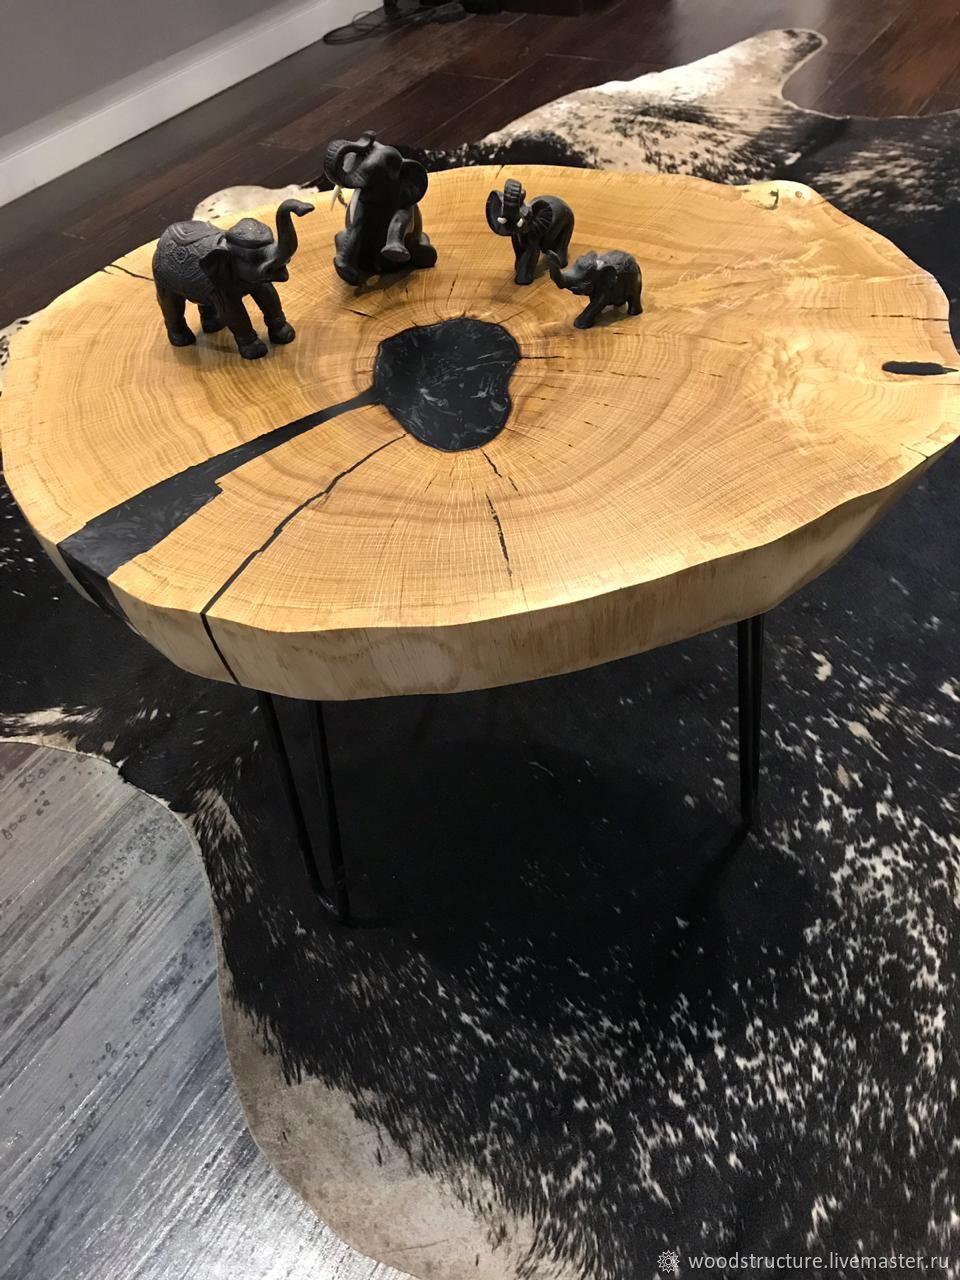 Кофейный стол, массив дуба, Столы, Звенигород,  Фото №1